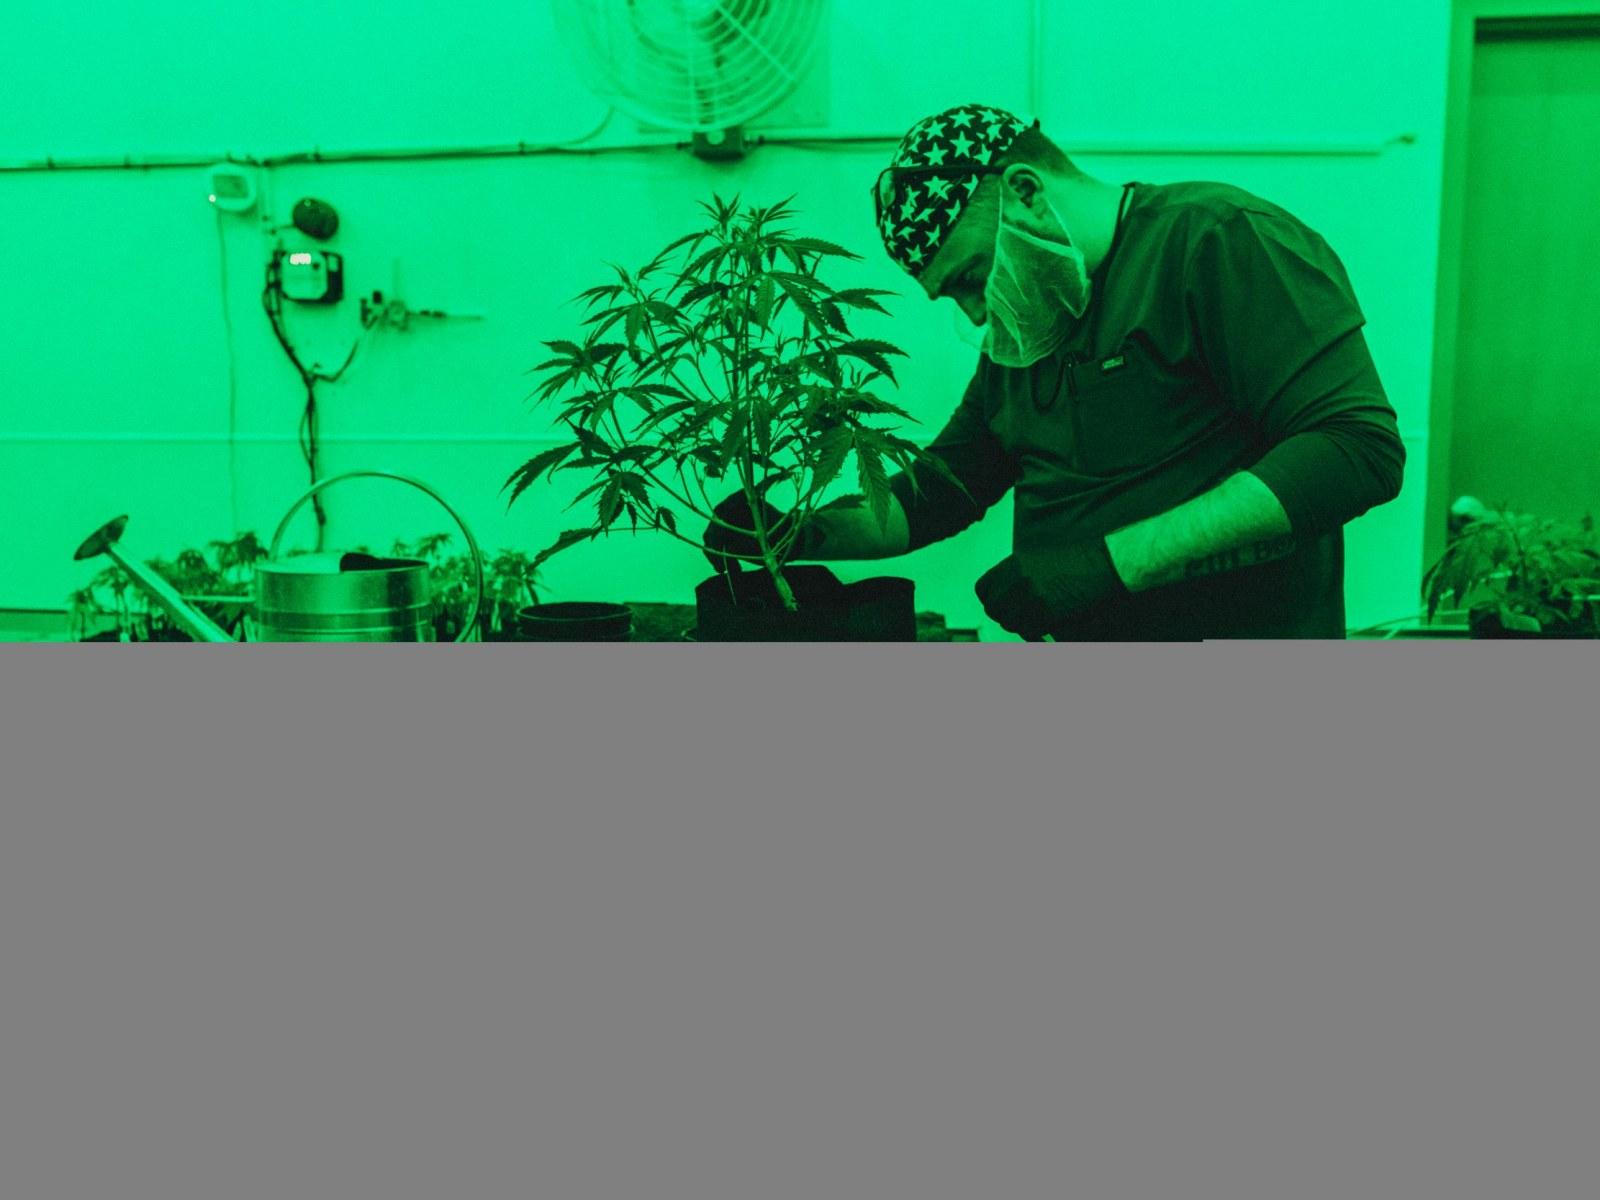 Texas' First Marijuana Dispensary Spurs Hope of Republicans Jumping